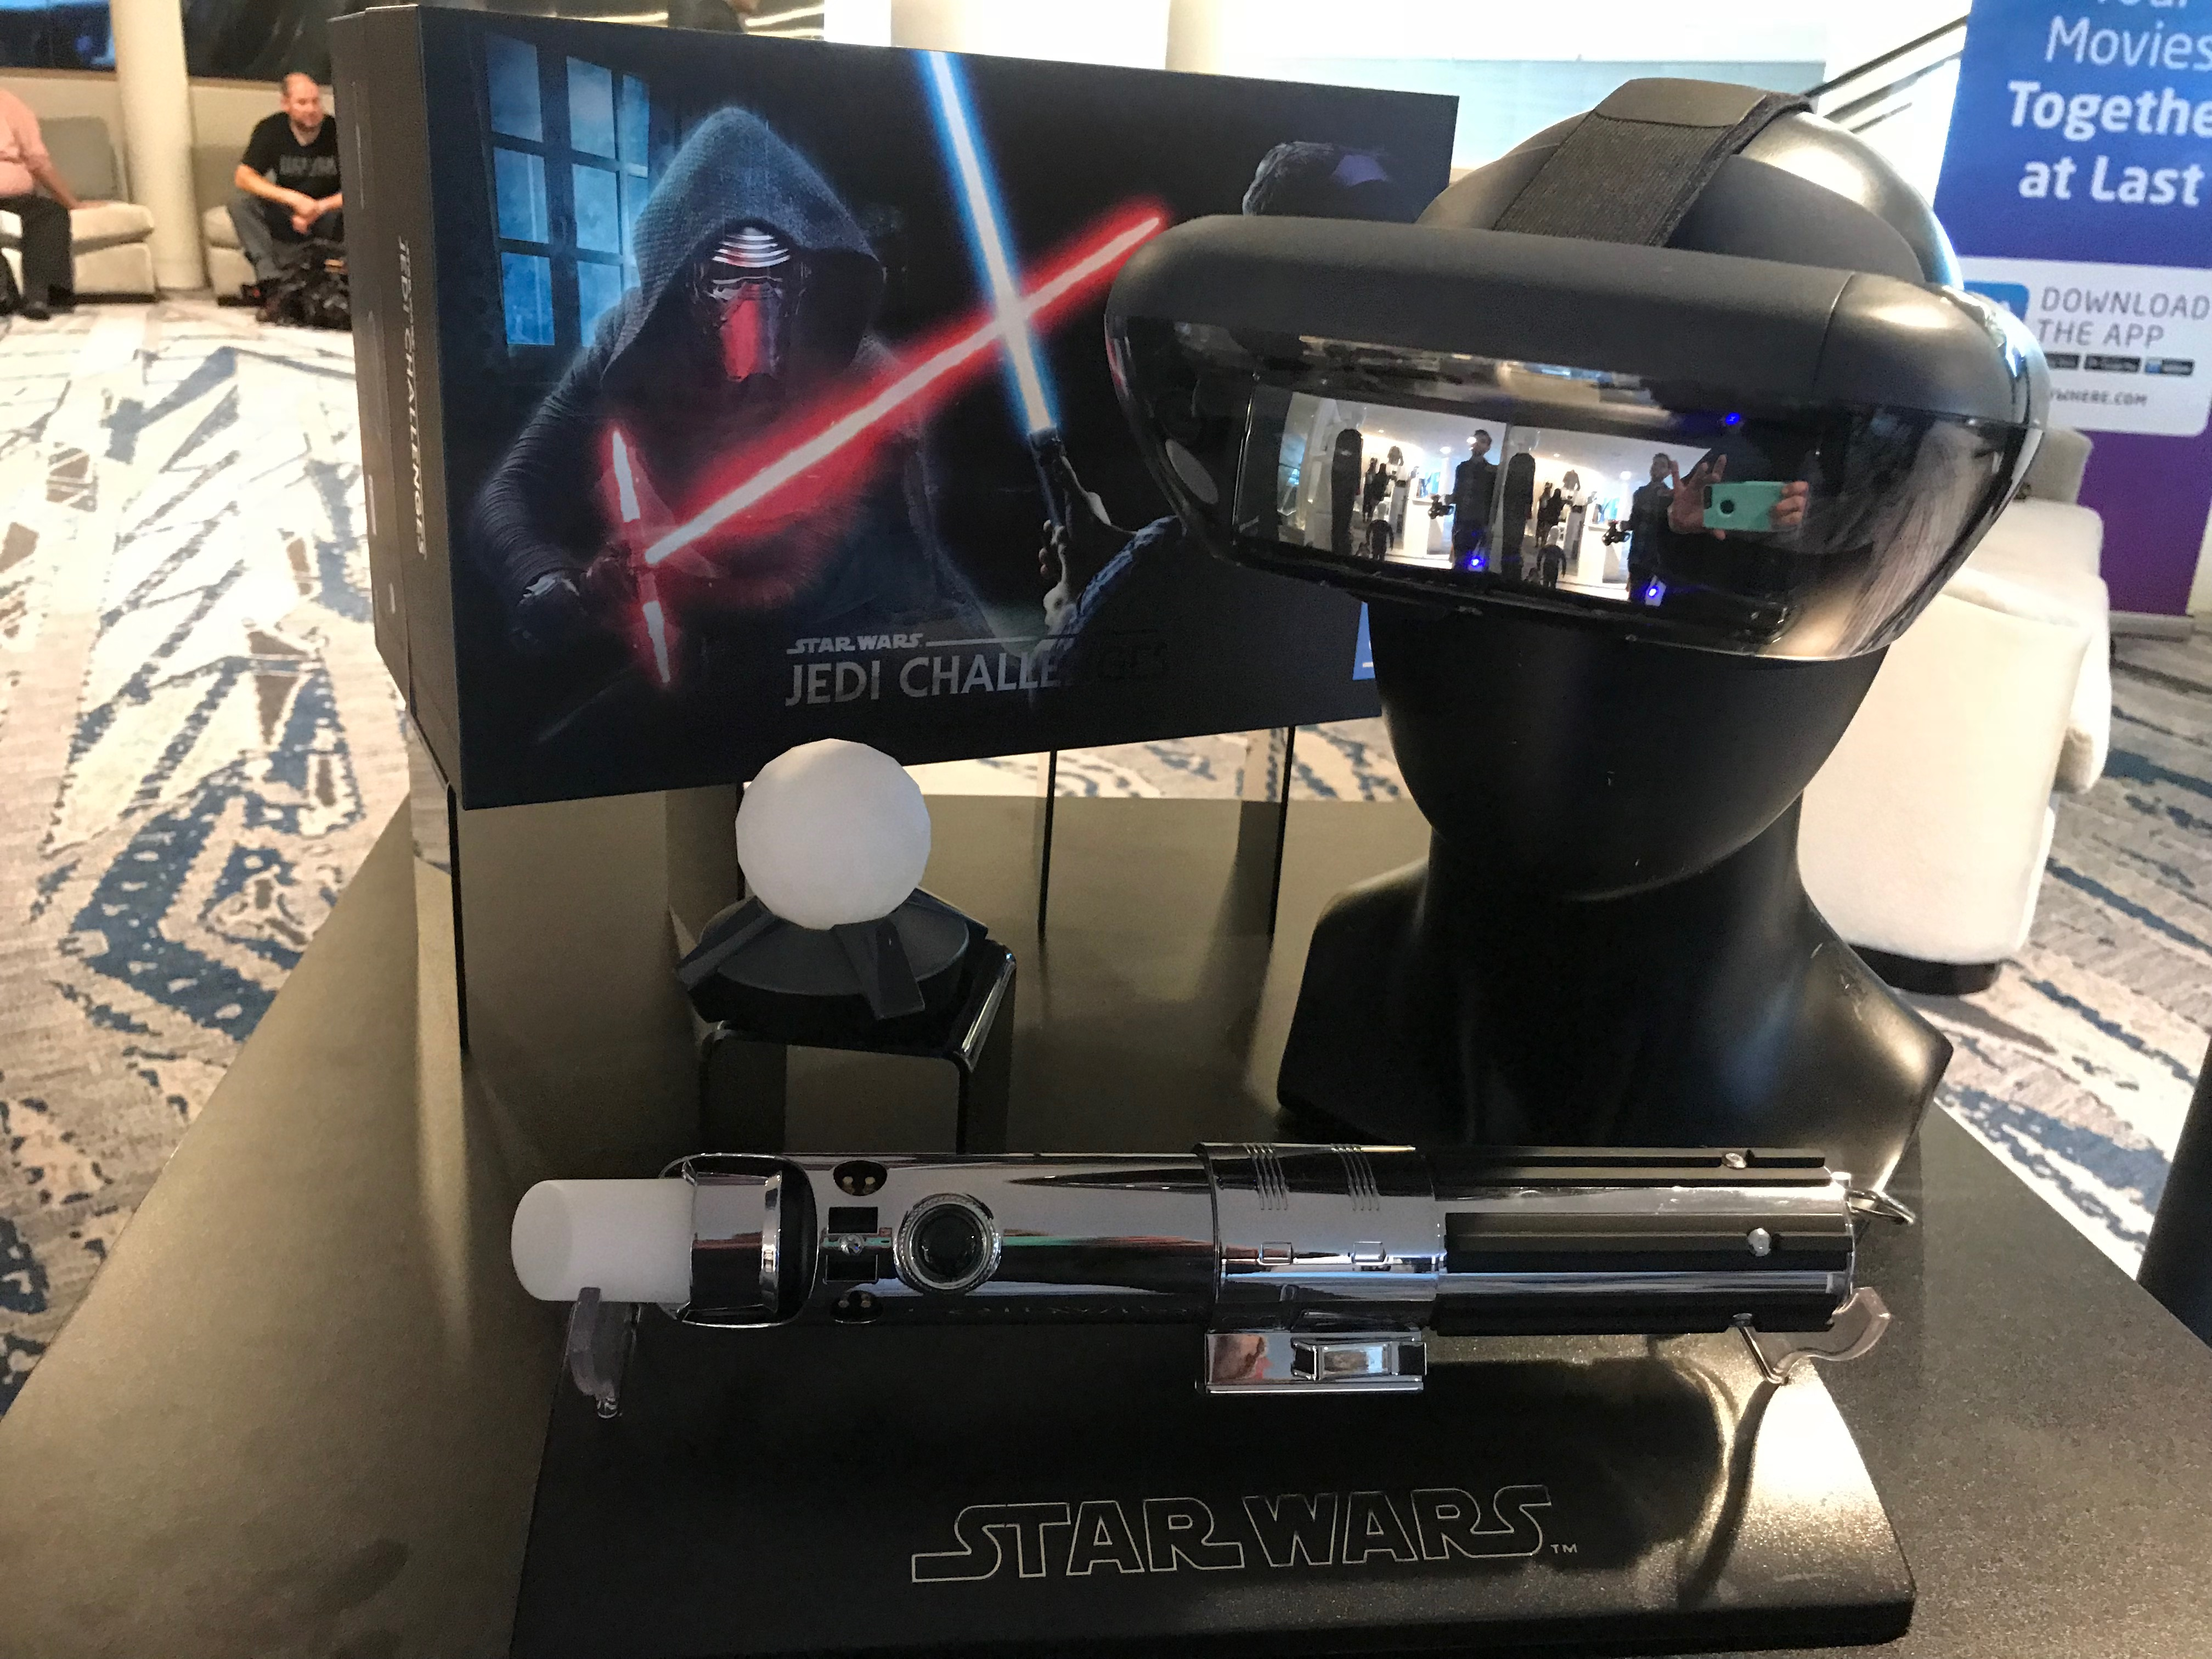 Star Wars Jedi Challenge Virtual Game